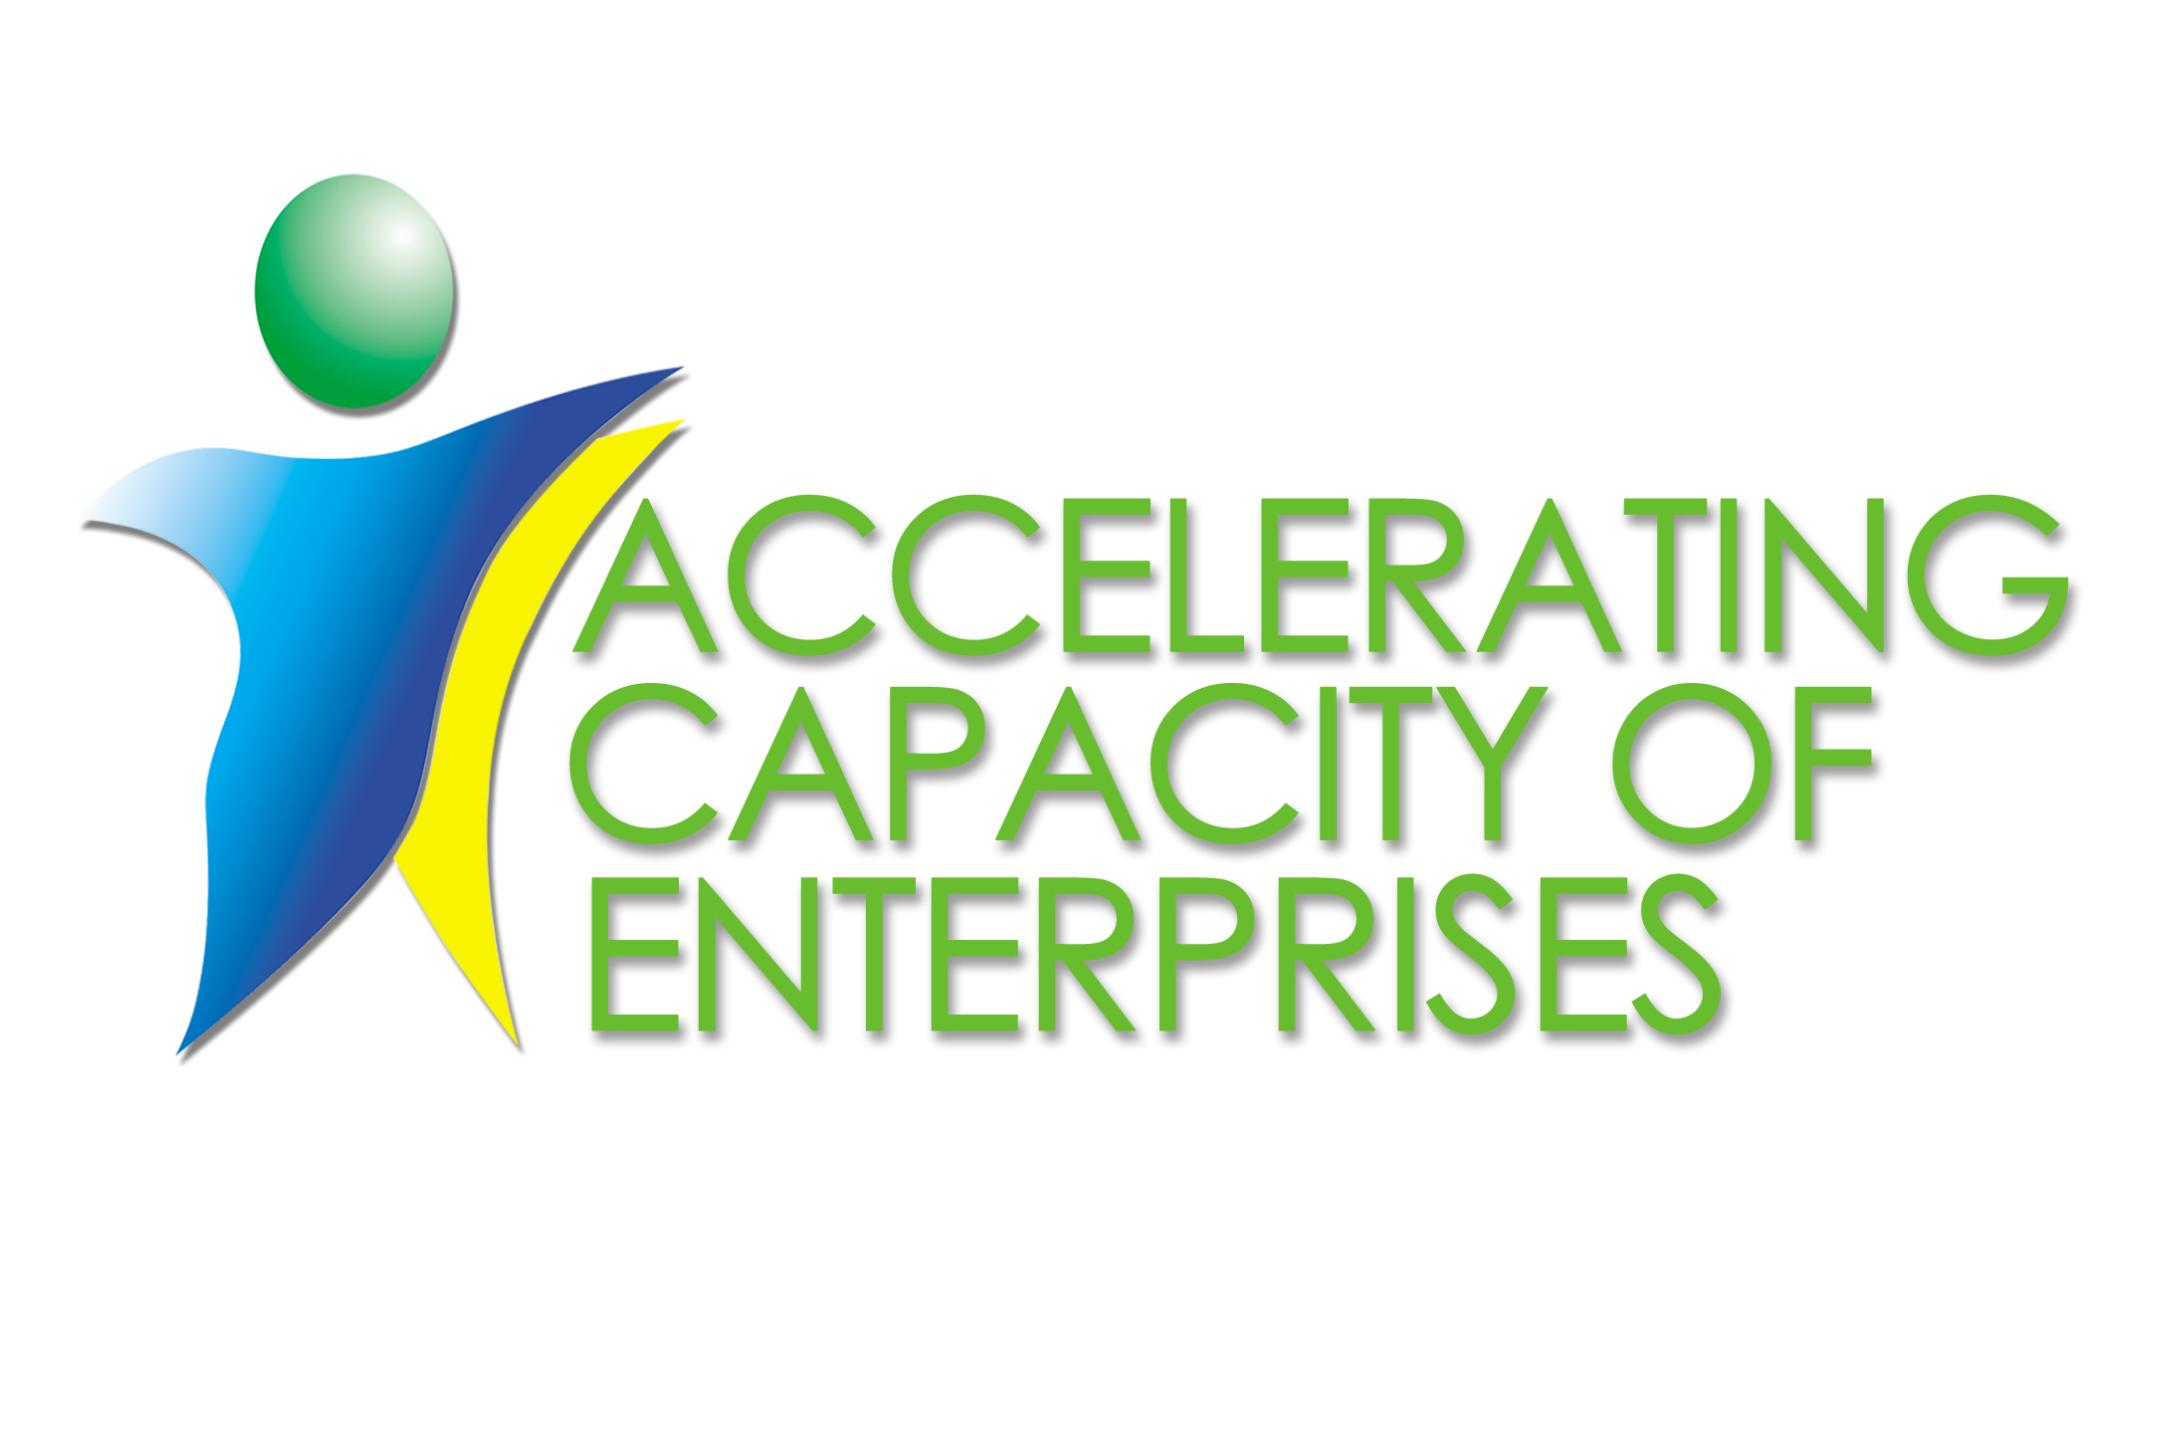 2014: Accelerating capacities of entrepreneurs